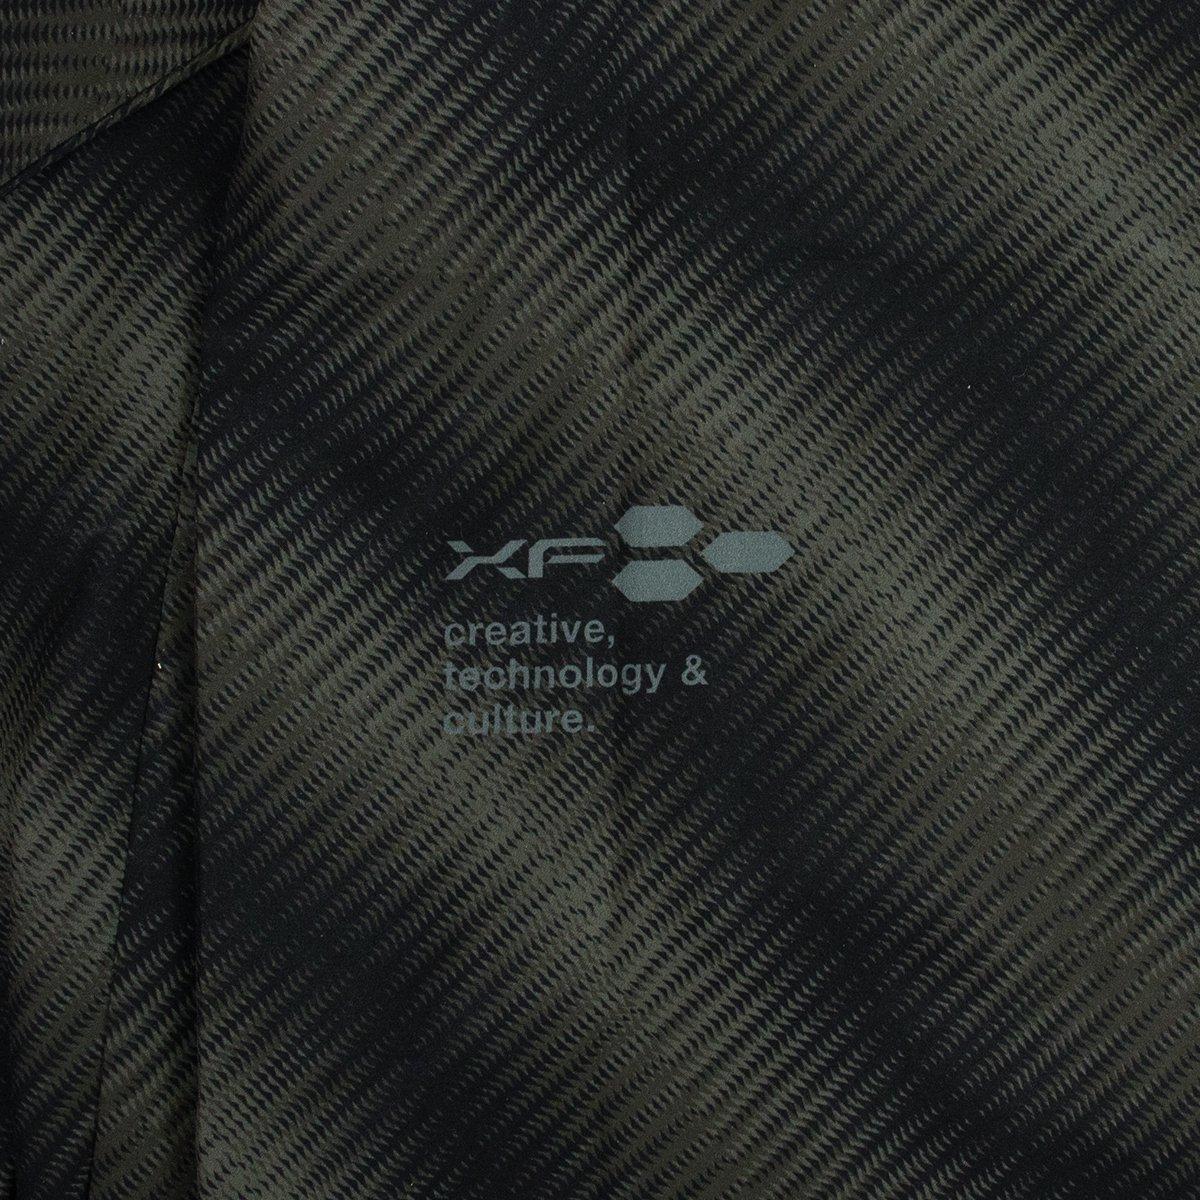 <img class='new_mark_img1' src='https://img.shop-pro.jp/img/new/icons8.gif' style='border:none;display:inline;margin:0px;padding:0px;width:auto;' />フーディージャケット '20 ブラック